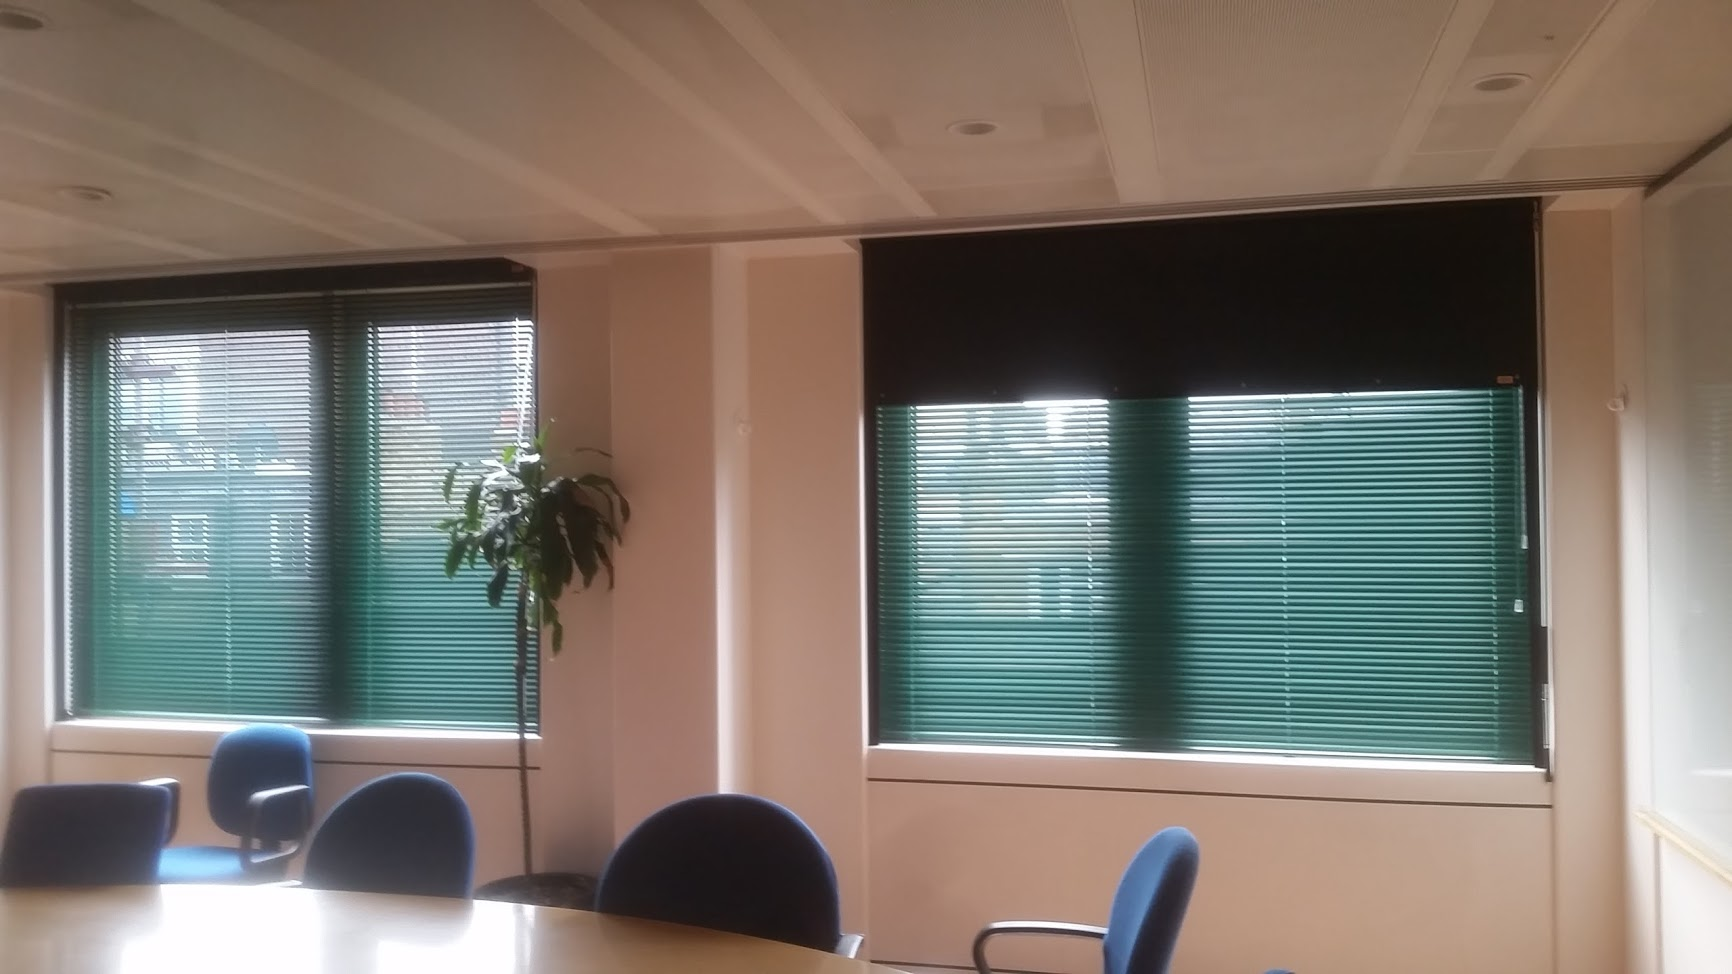 Aluminium Venetian And Blackout Box Blinds For Meeting